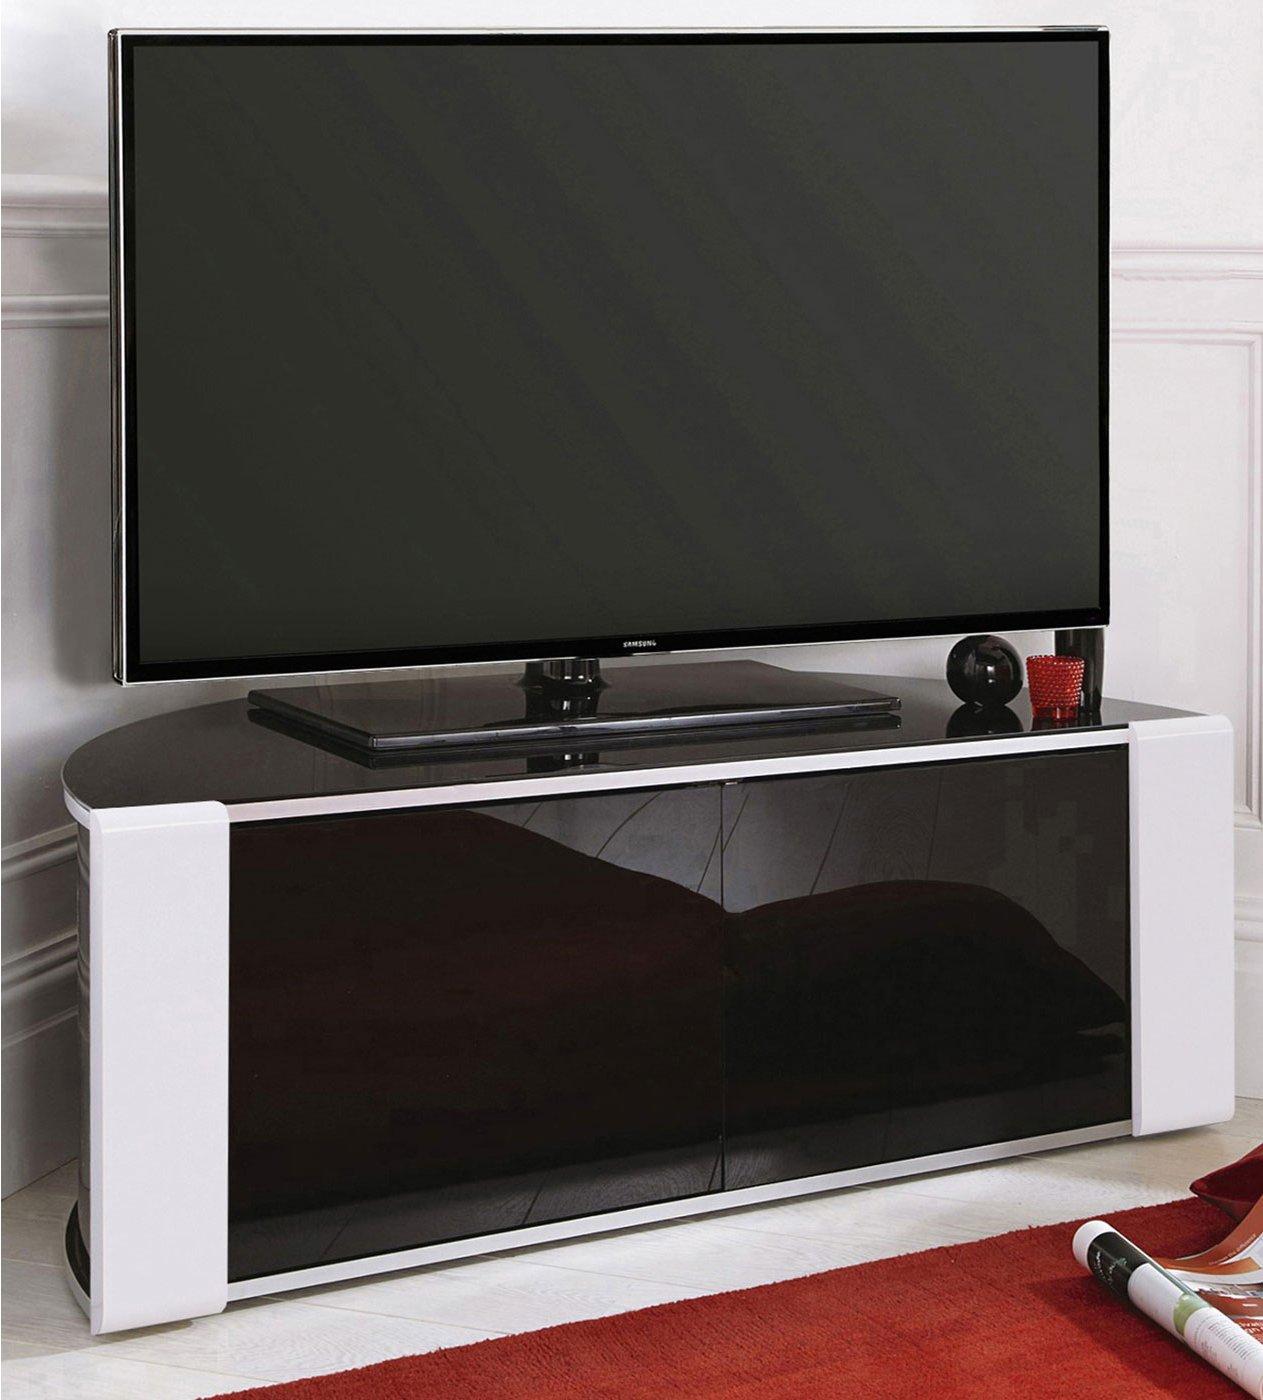 hot sale online 61f53 6cafd MDA Designs Sirius 850 Black and White Corner TV Cabinet